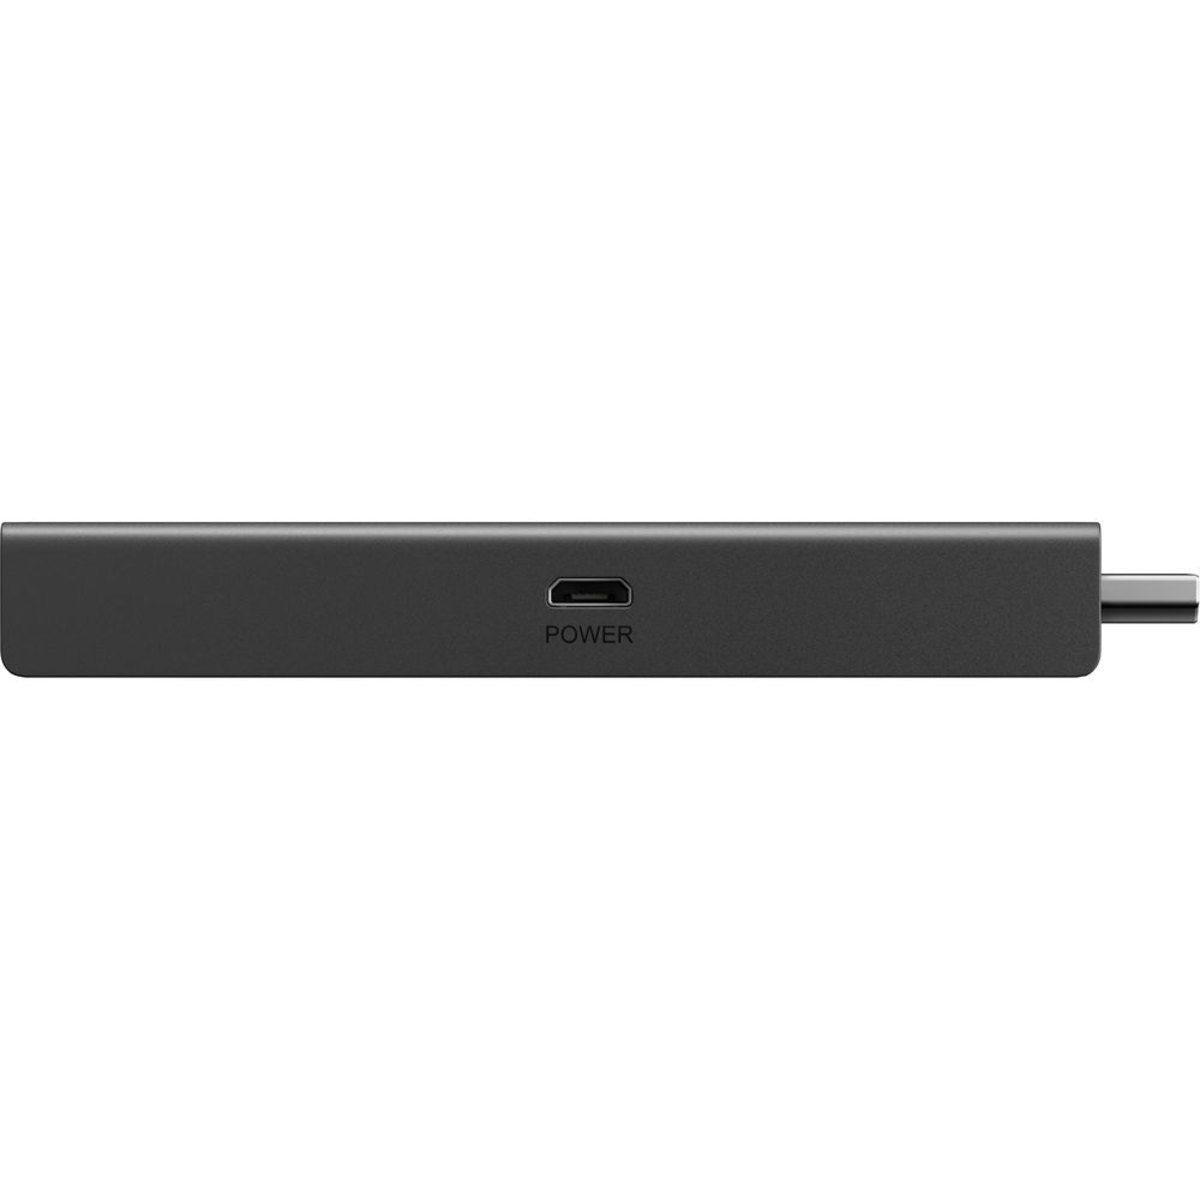 Fire Tv Stick - TV Box FullHD - Amazon